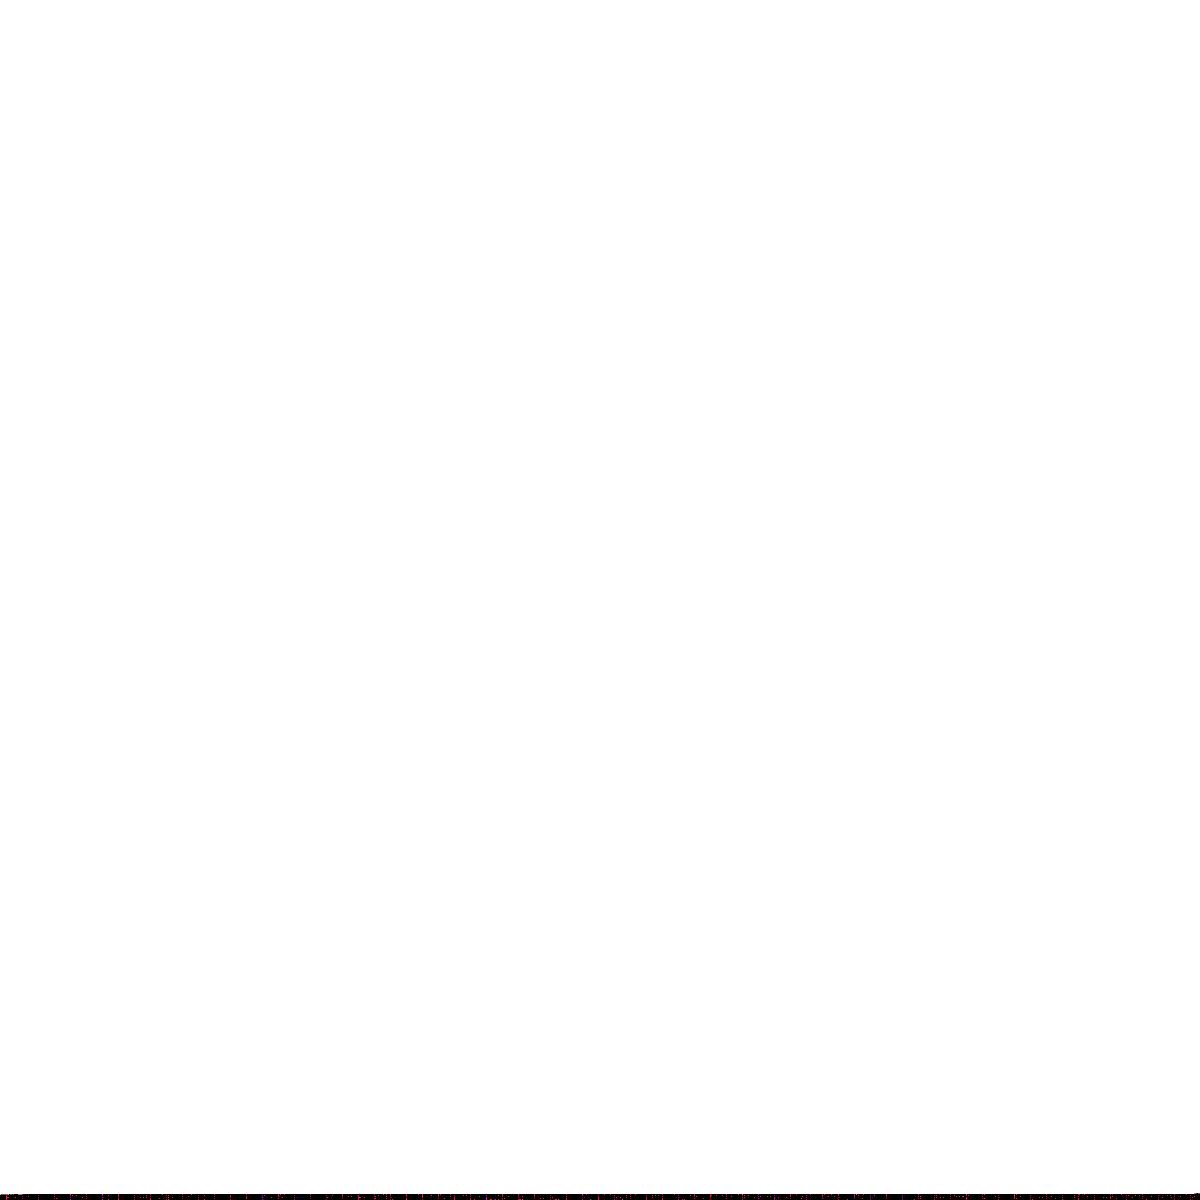 jeffrey flanagan | Visual Designer